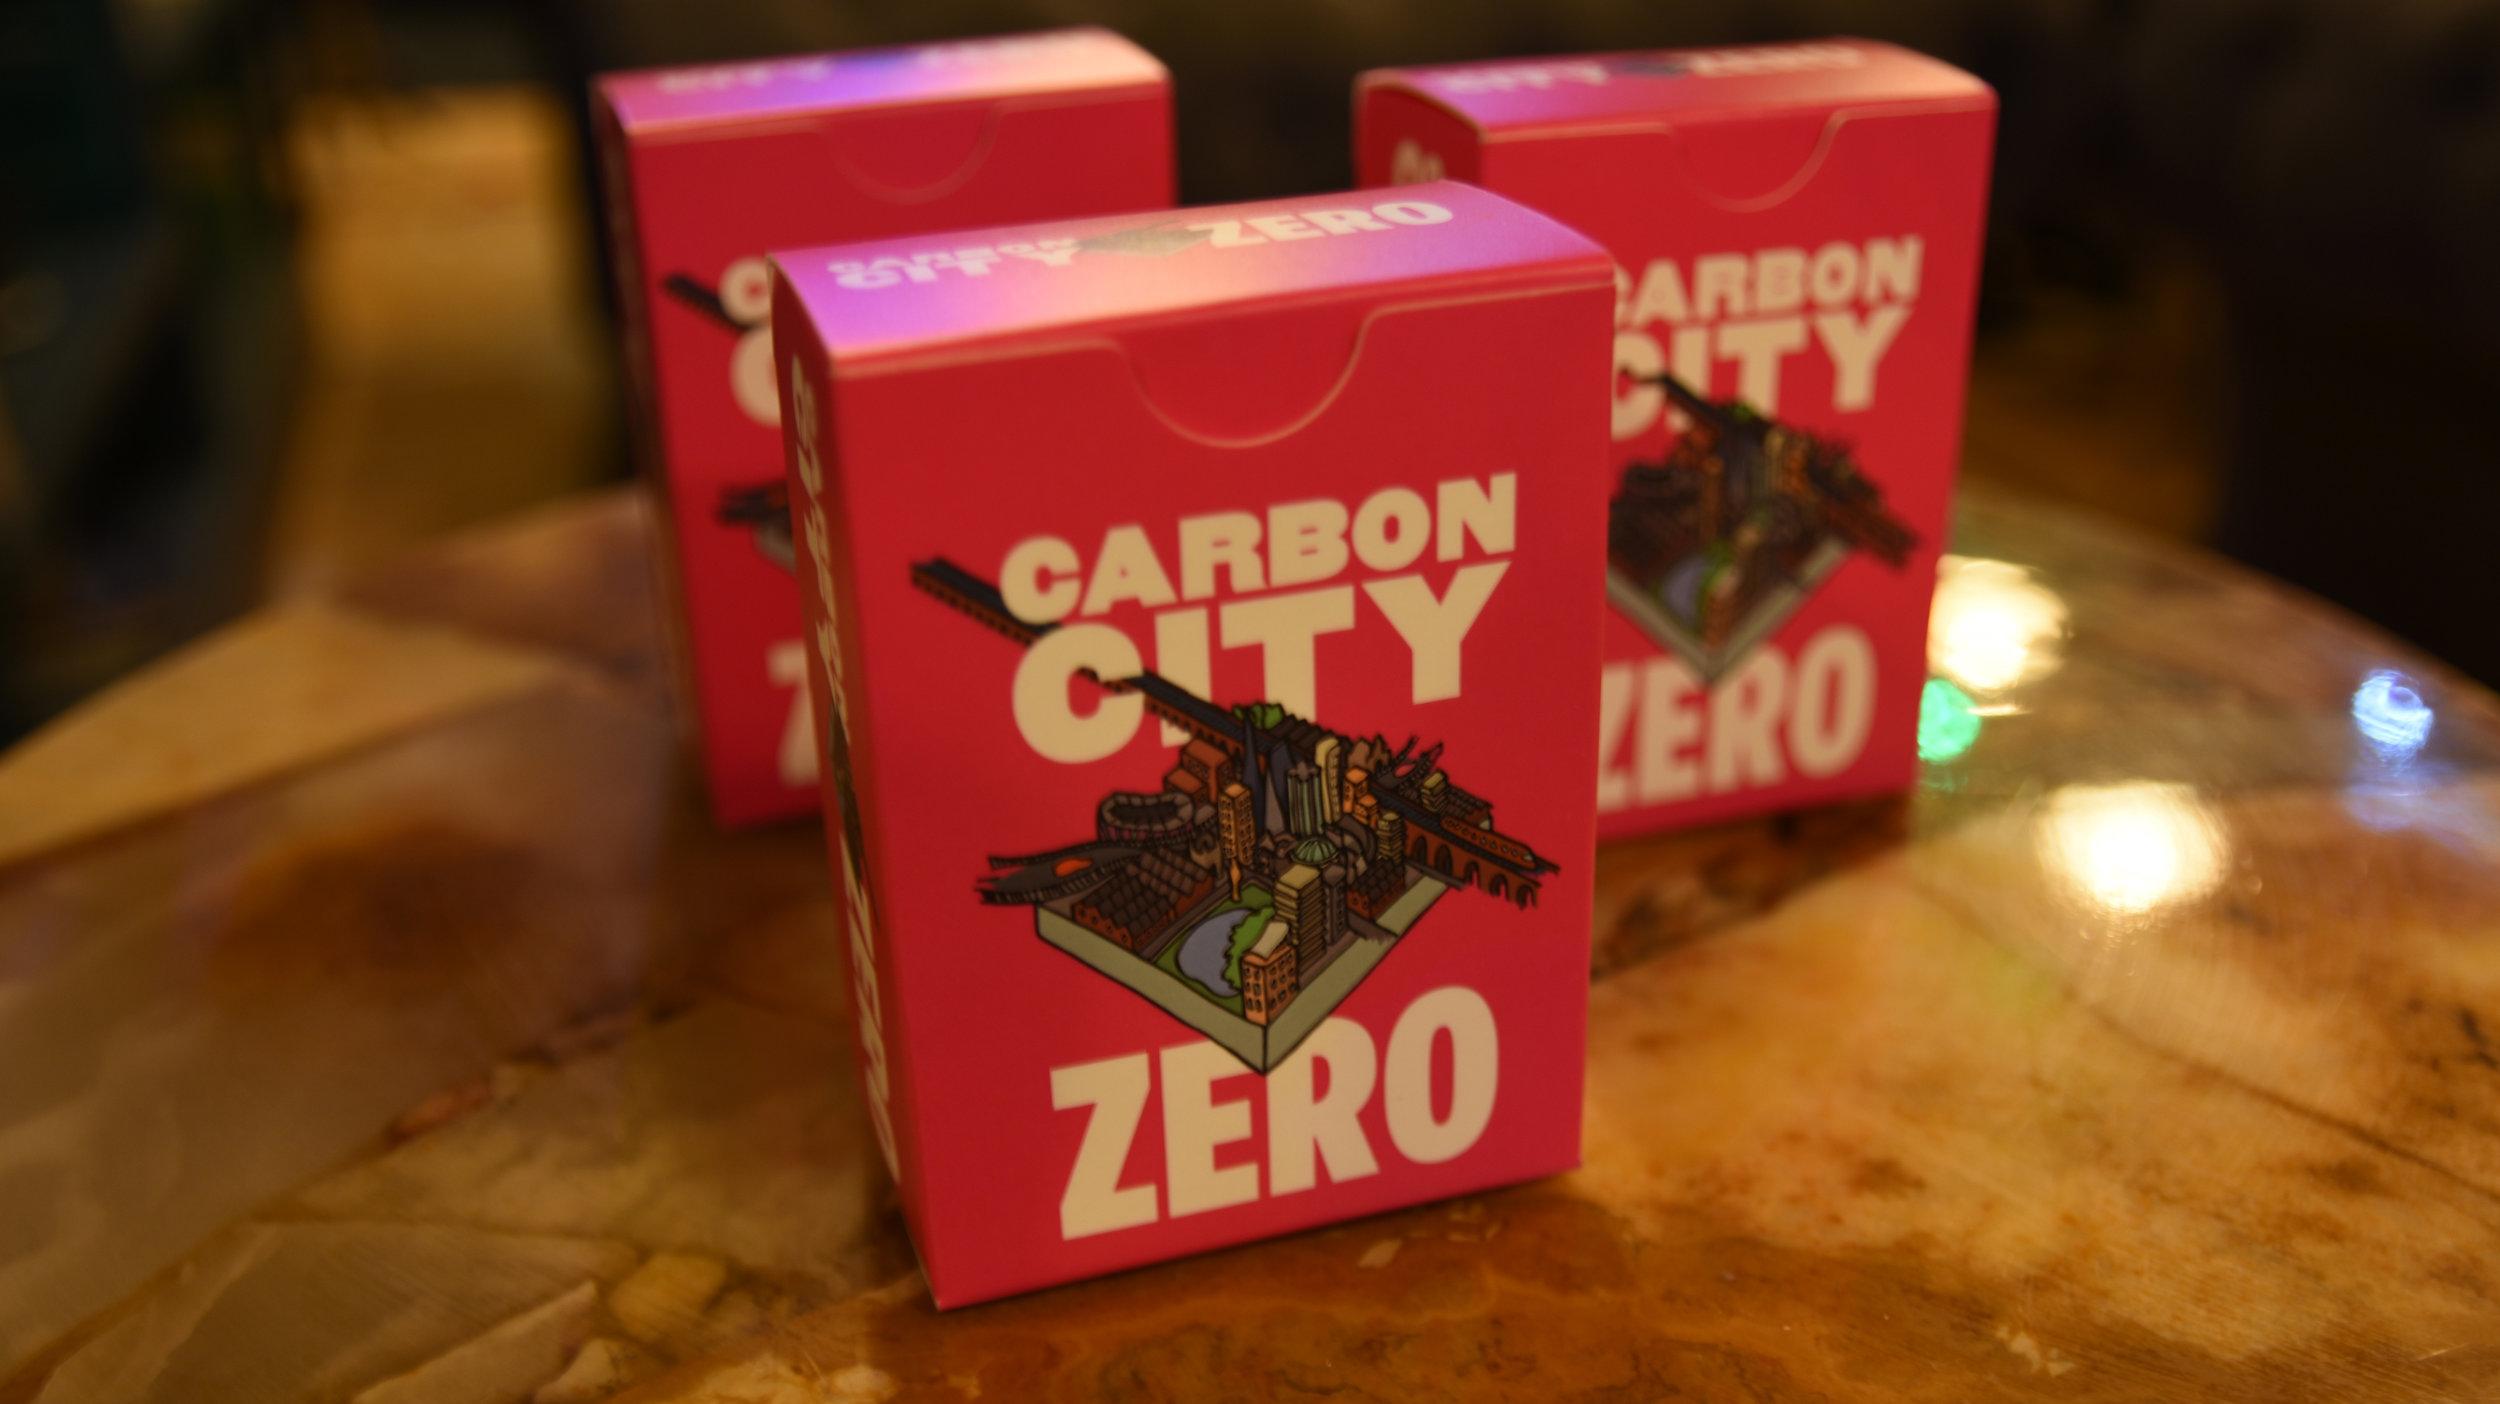 carbon city zero game. link: carbon city zero.